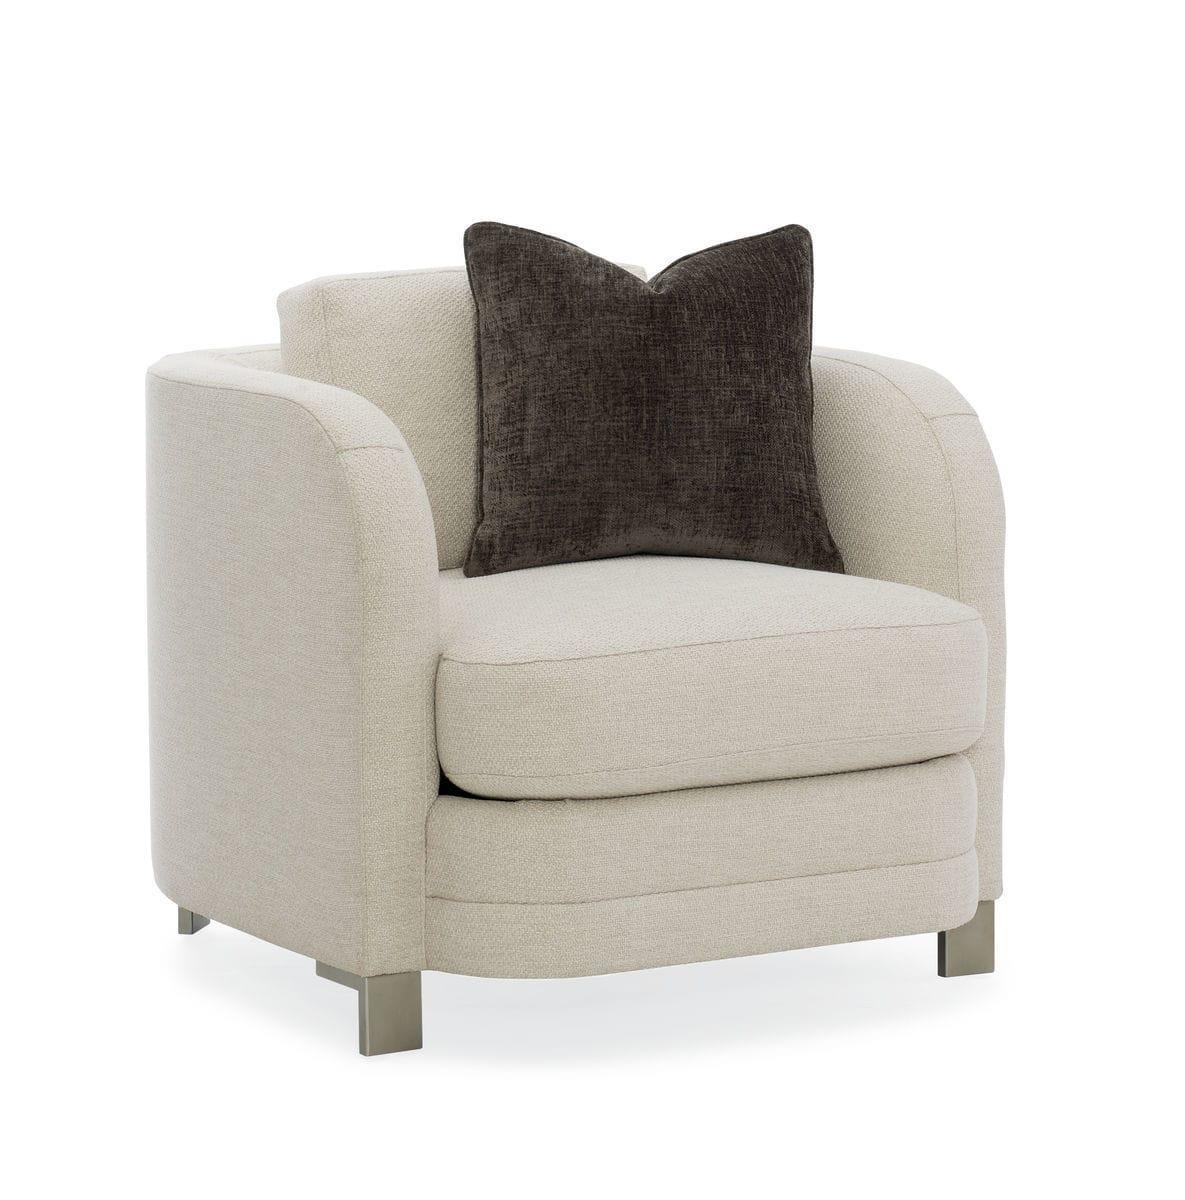 Astounding Contemporary Armchair Fabric Lacquered Metal Standard Creativecarmelina Interior Chair Design Creativecarmelinacom